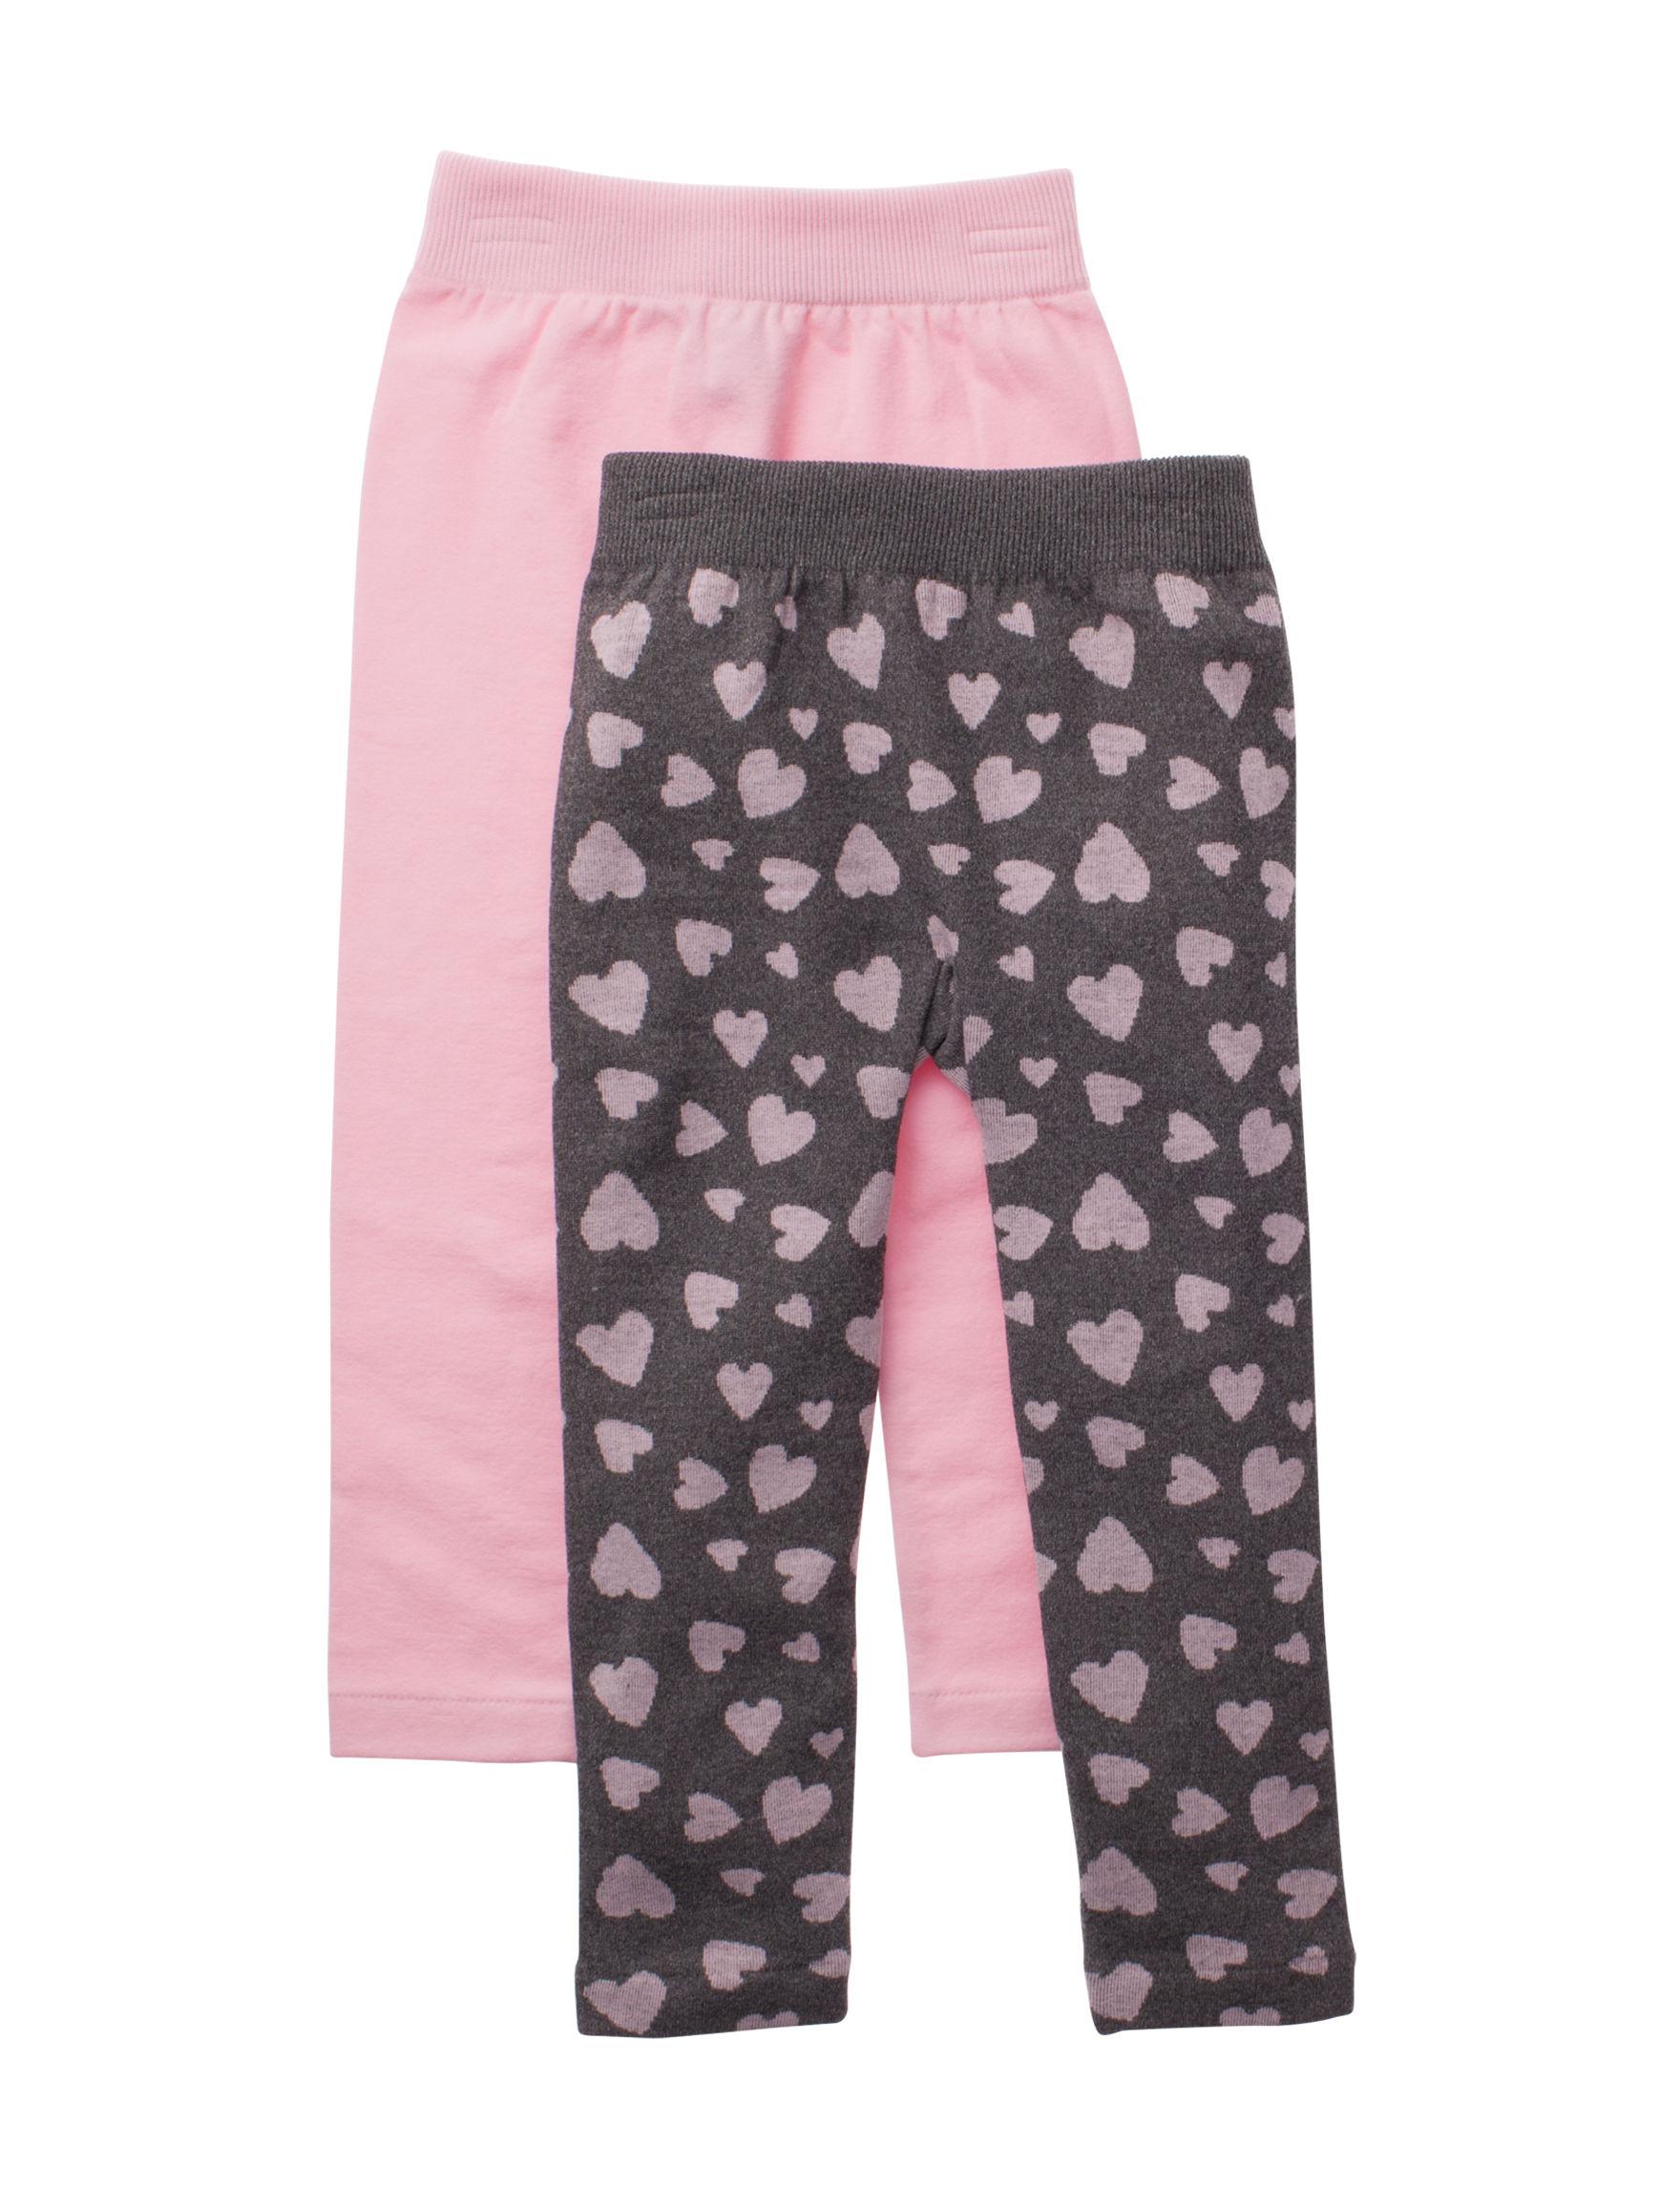 Wishful Park Grey / Pink